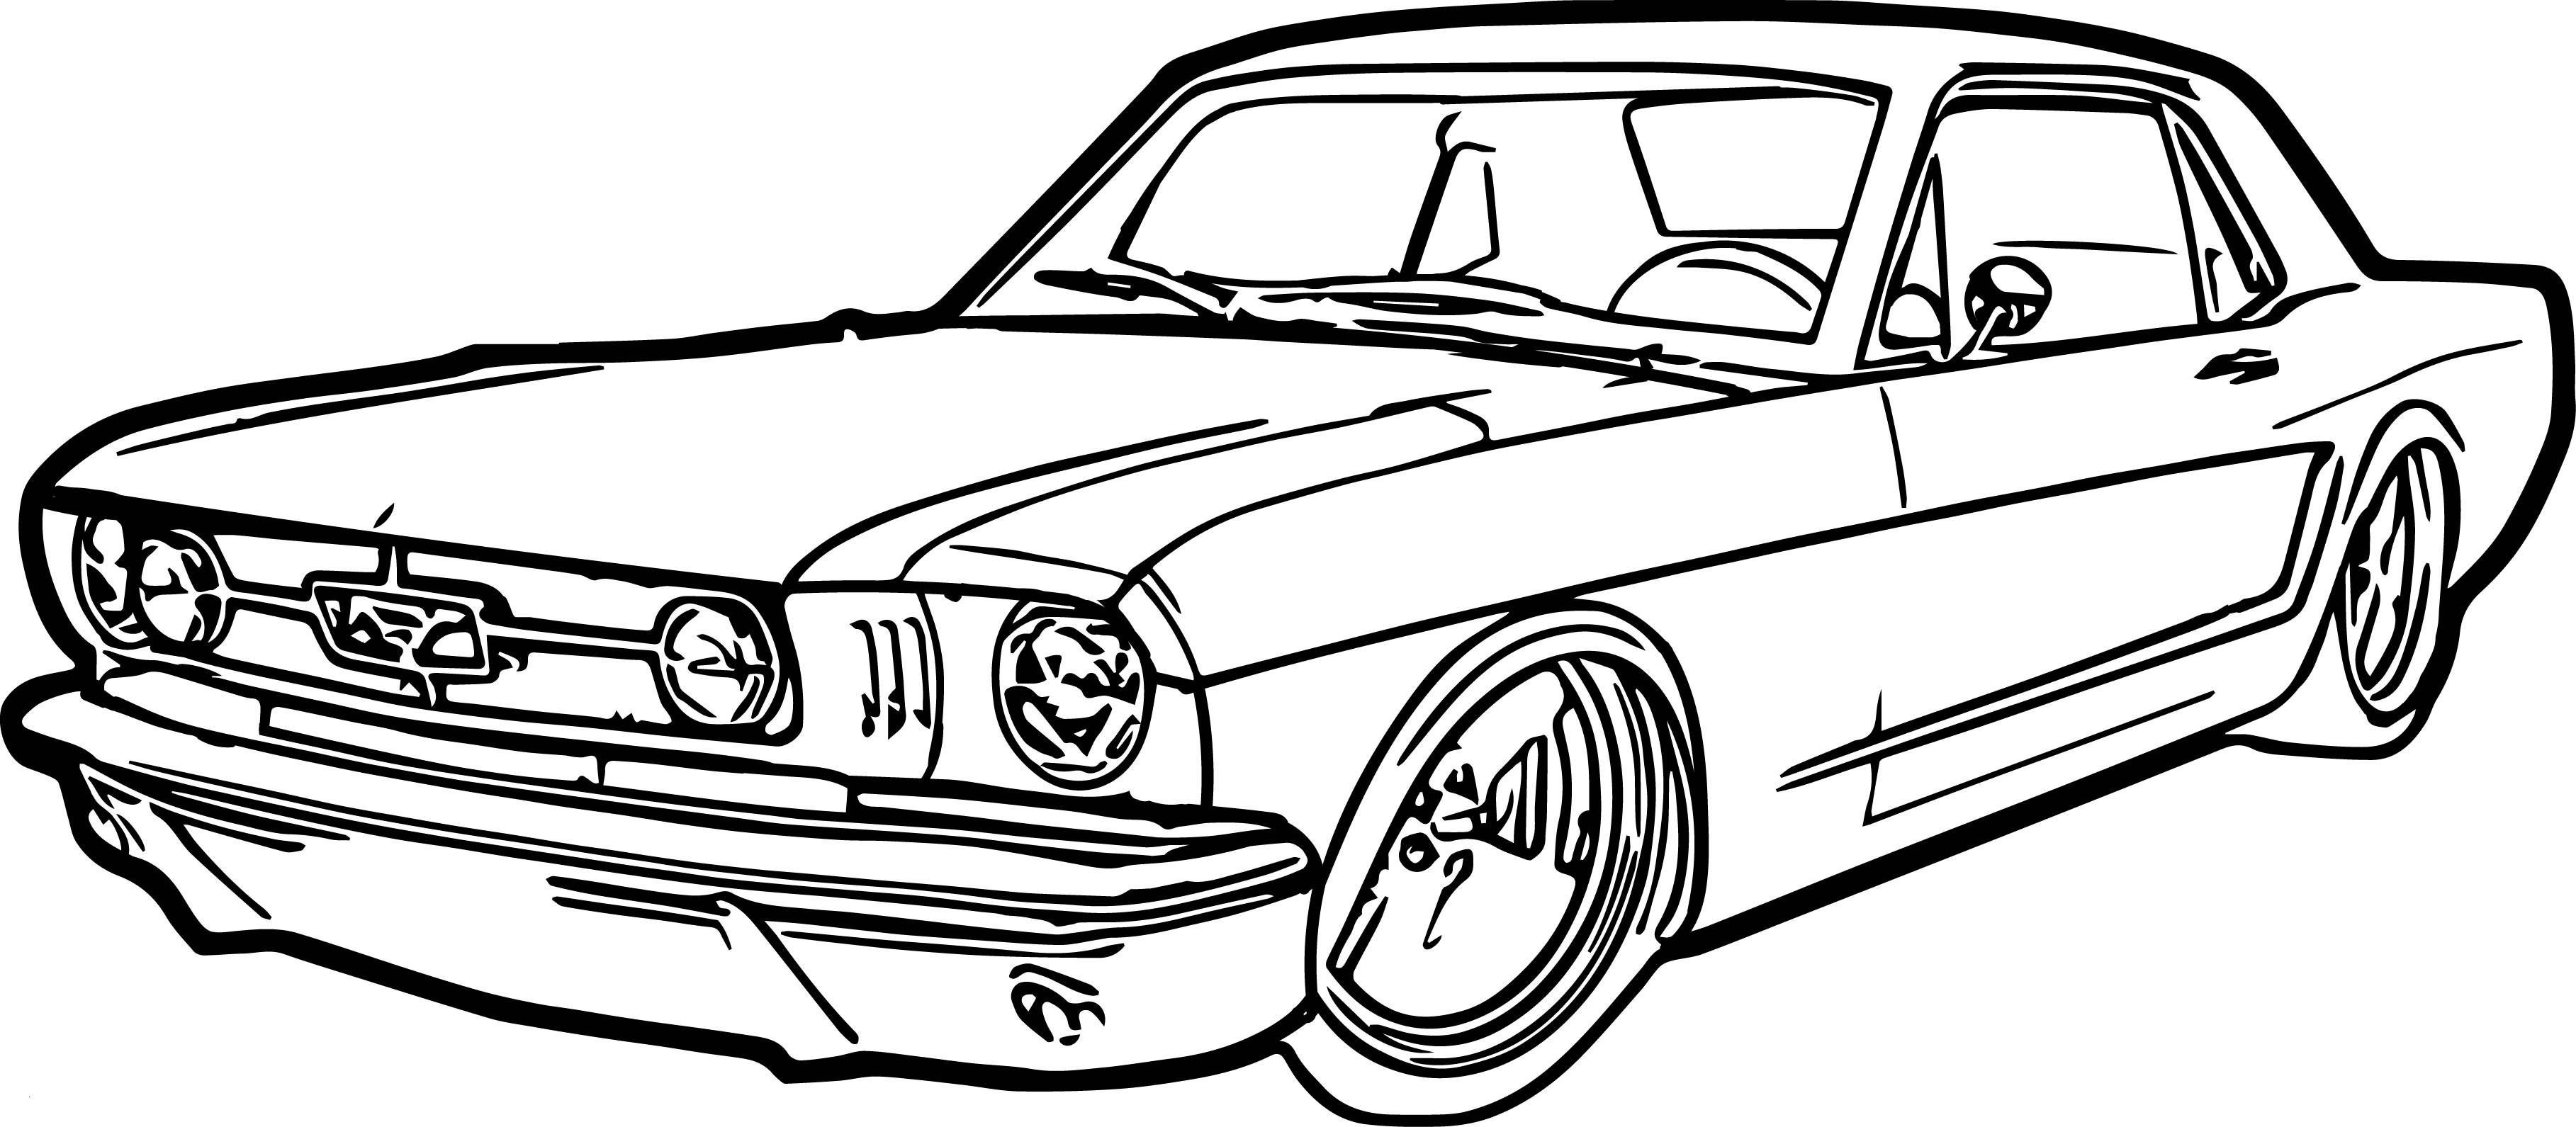 3635x1591 Car Design Sketch Images New How To Draw Vectors Vector